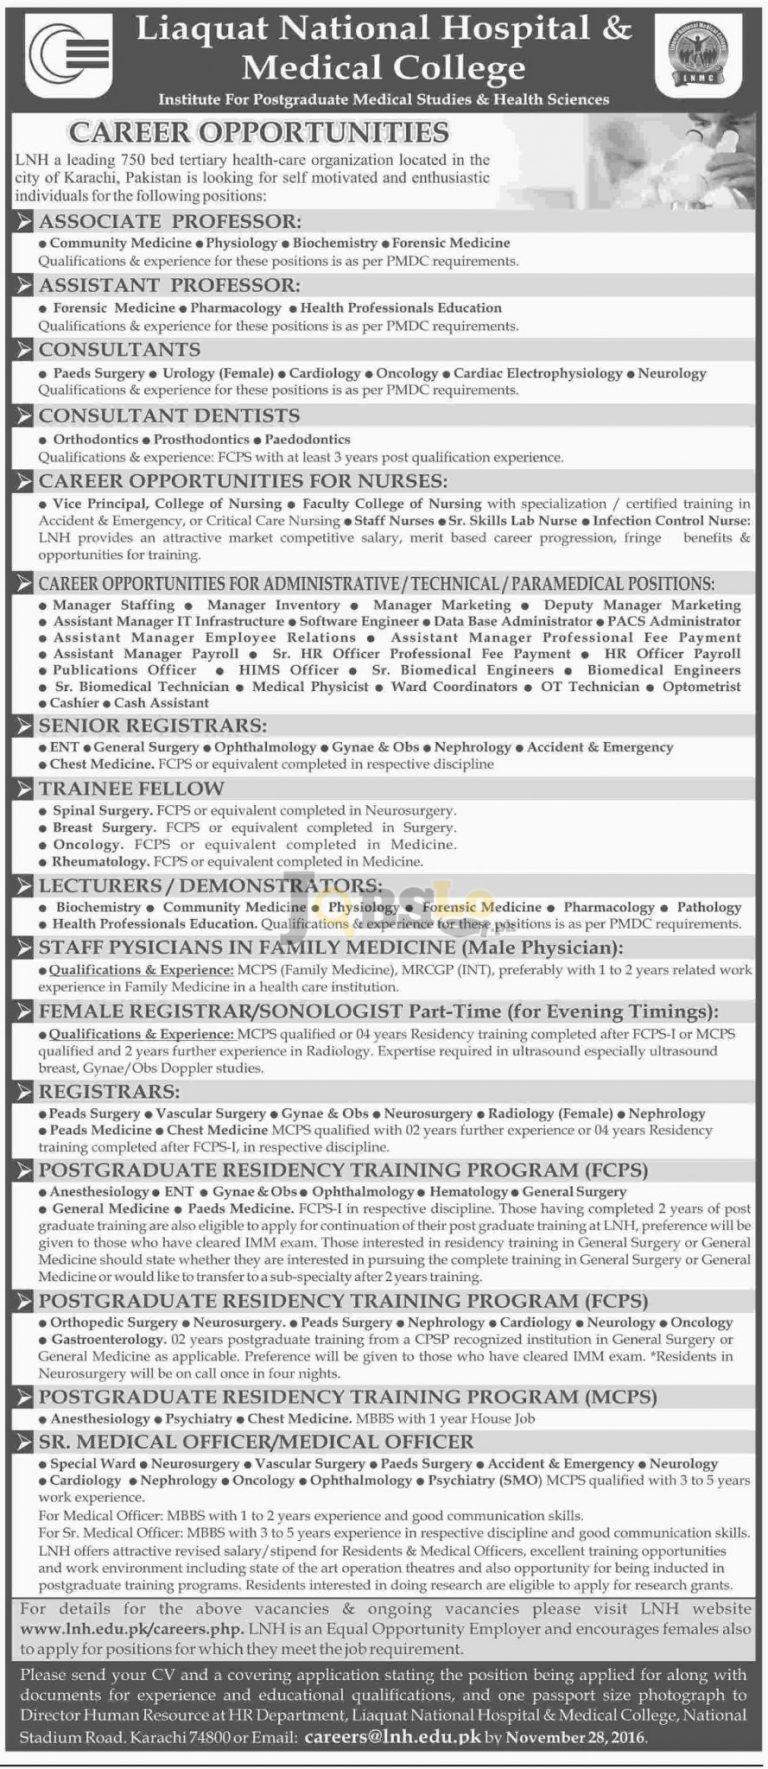 Liaquat National Hospital & Medical College Karachi Jobs 2016 Staff Required Latest Add